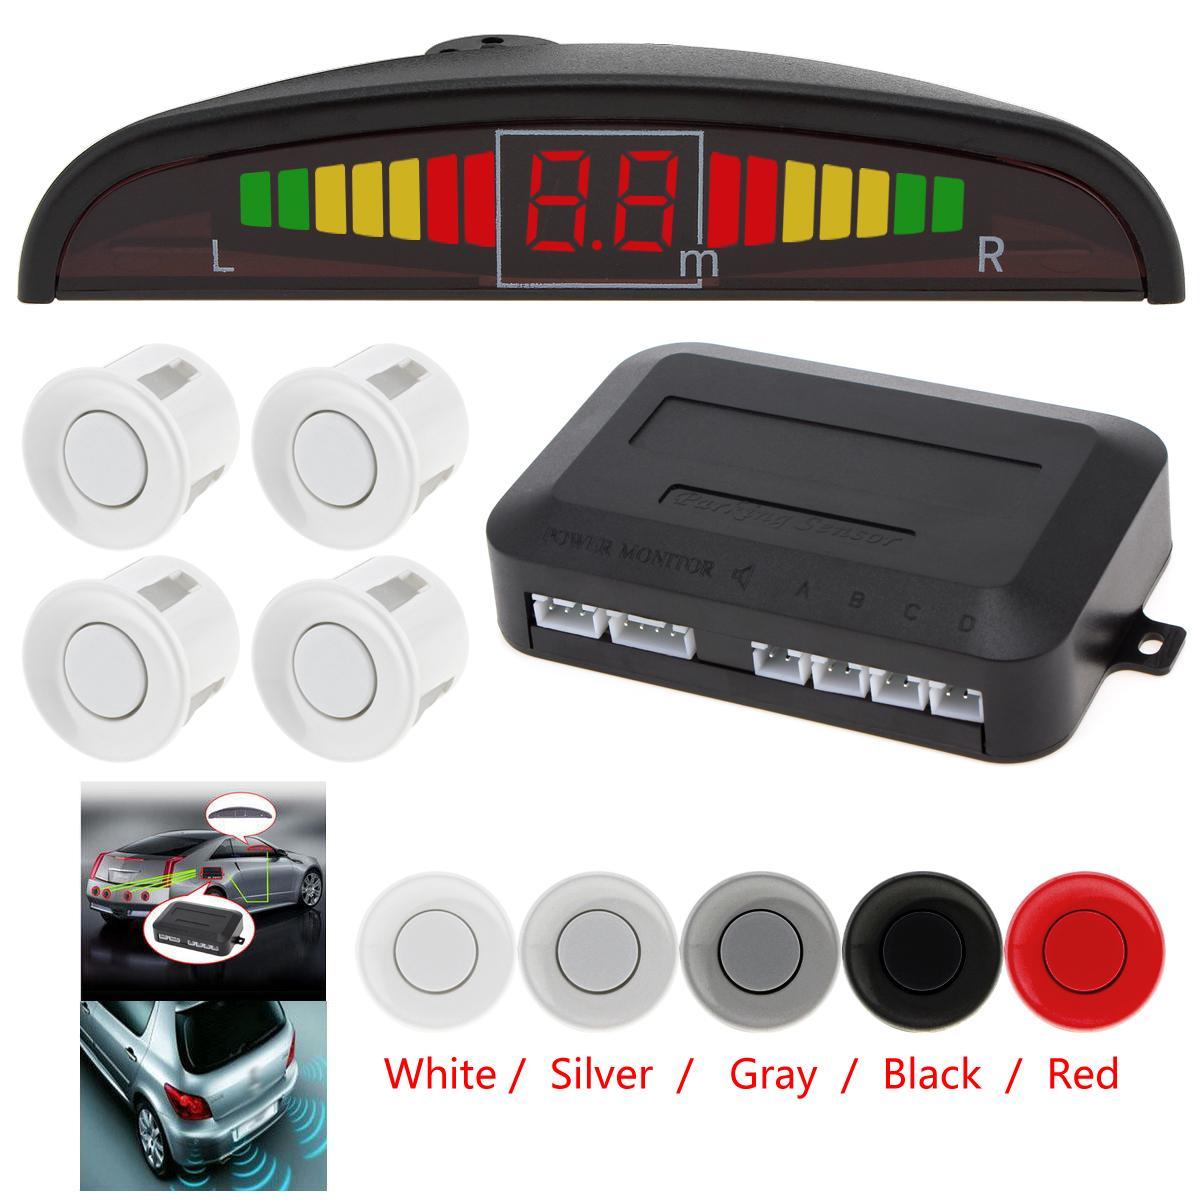 1 Set Verkaufs-Auto-Auto Einparkhilfe LED-Parken-Sensor Ultraschall-Rückunterstützung Sensoren Radar-Detektor-Kit mit Hintergrundbeleuchtung Display-CAL_200